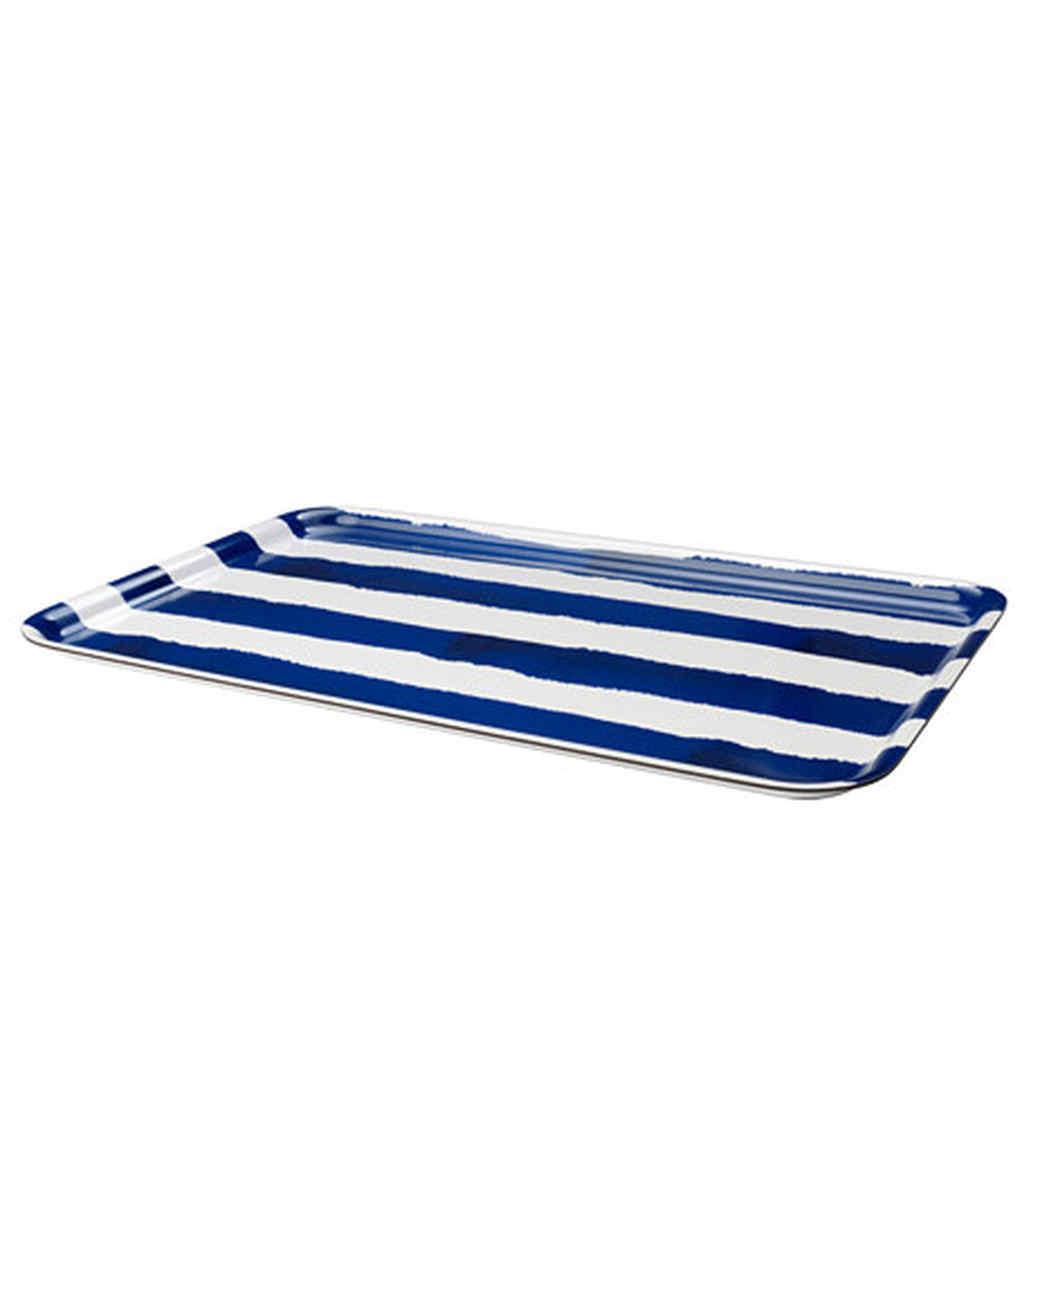 ikea-striped-tray.jpg